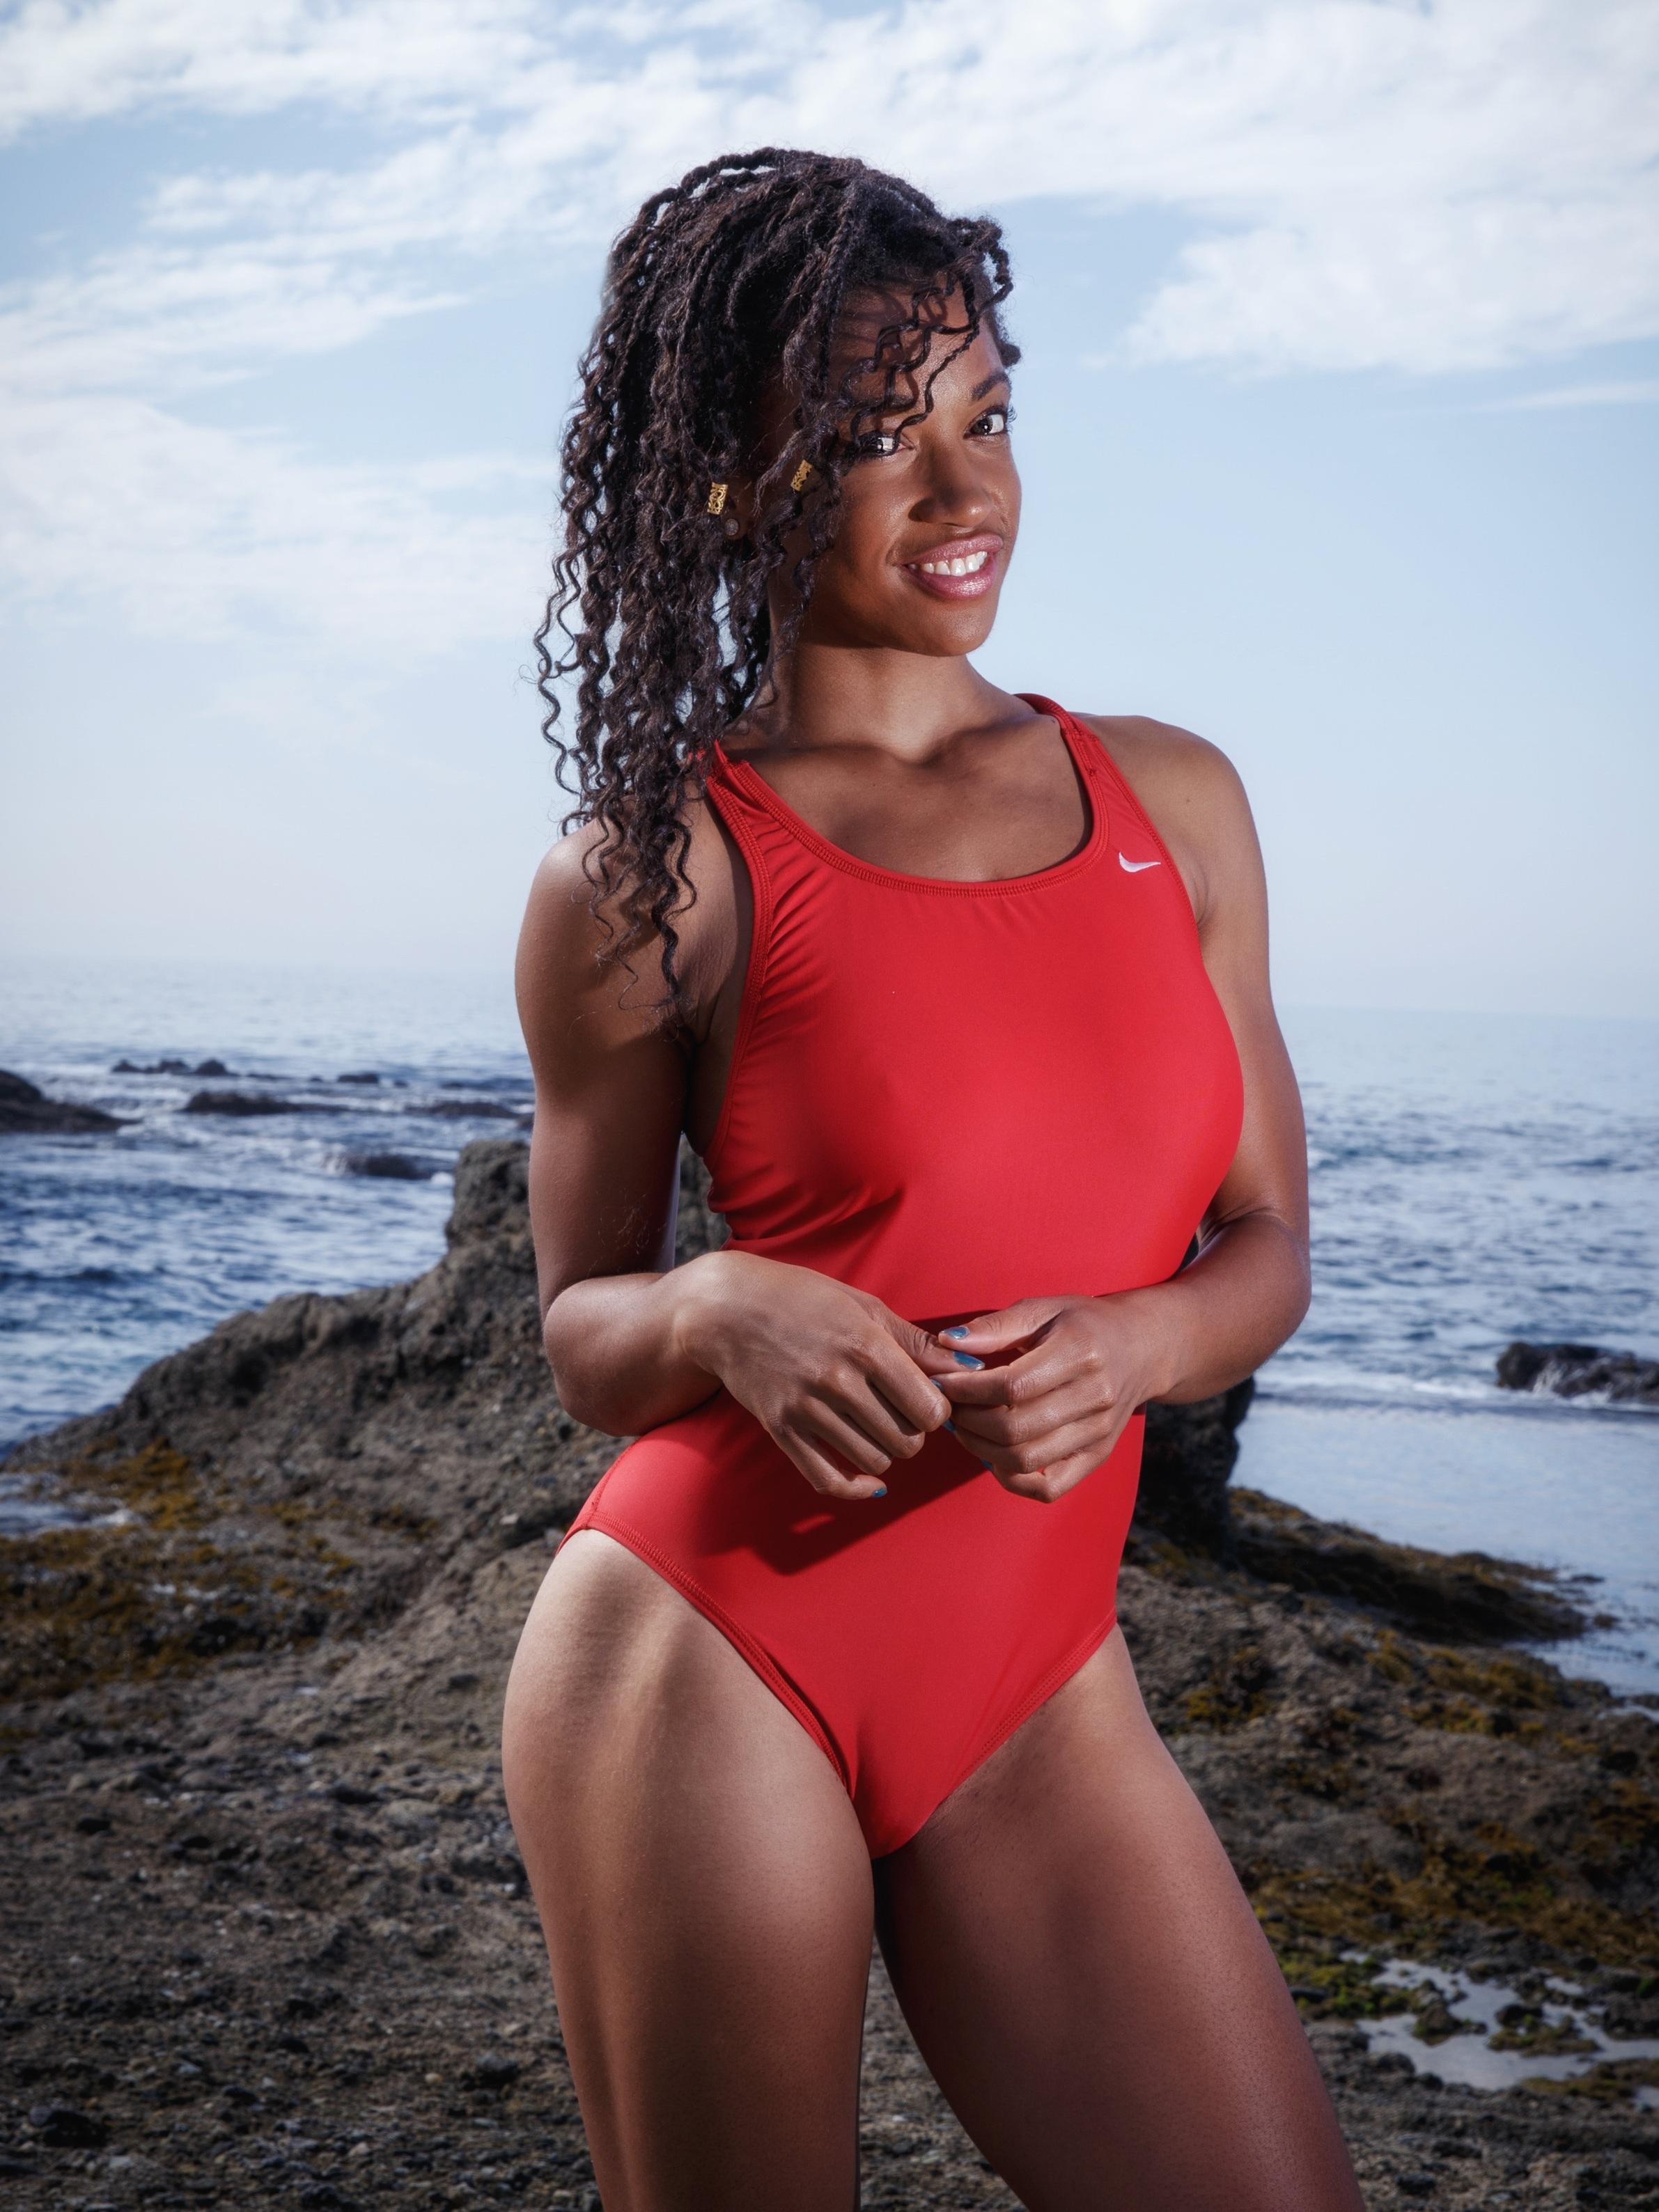 Leah - Height: 5'8Origin: HawaiiBio: sunny island girl, personal trainer, bartender, model and actress.